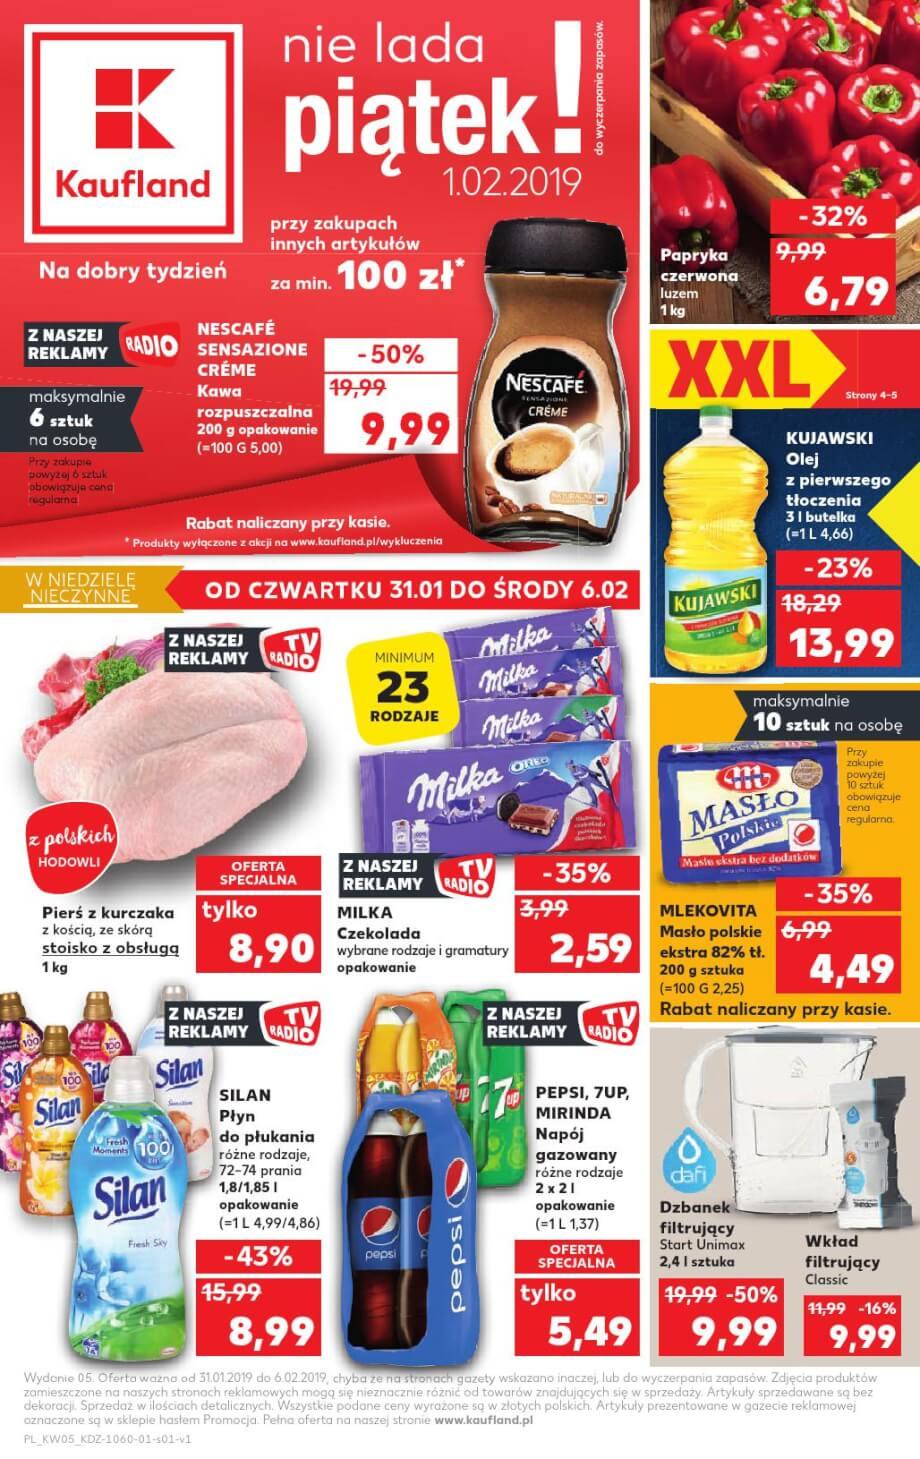 Kaufland, gazetka do 06.02.2019